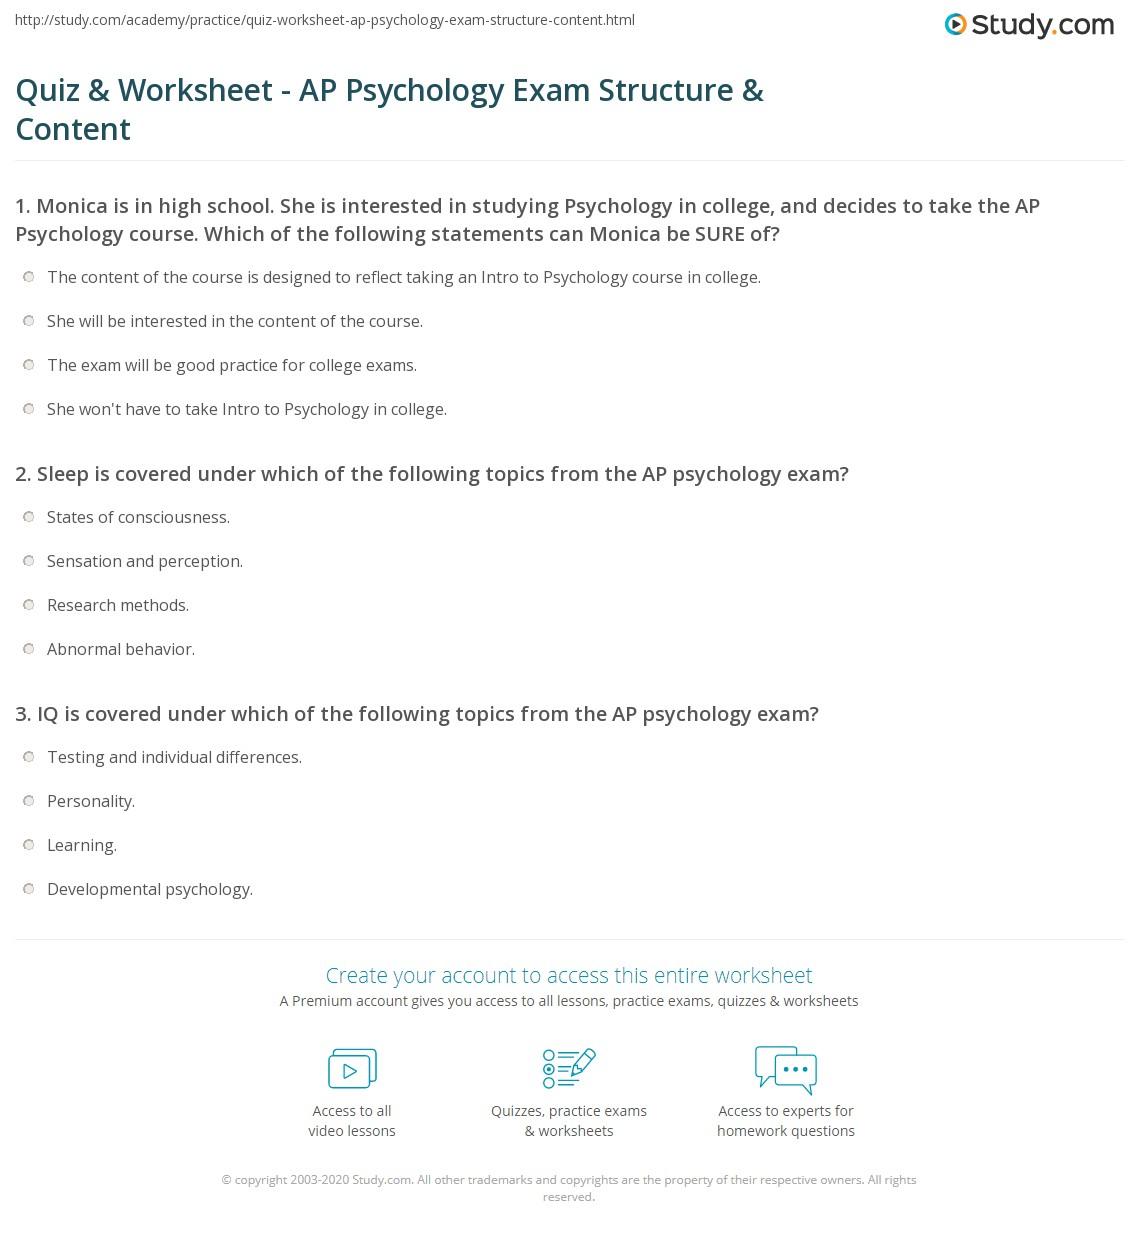 Workbooks psychology worksheets : Quiz & Worksheet - AP Psychology Exam Structure & Content | Study.com